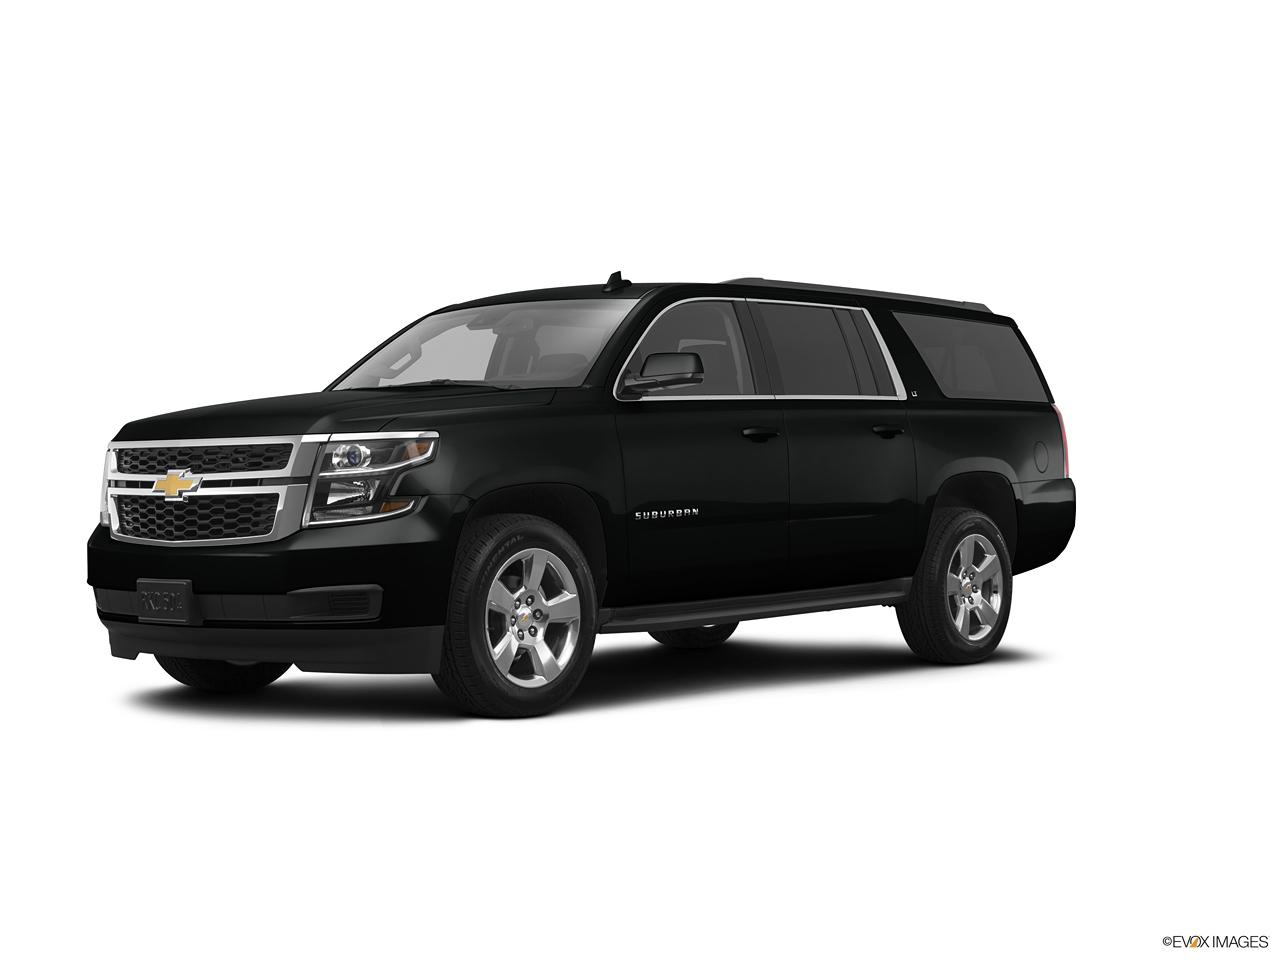 2017 chevrolet suburban fuel tank capacity reviews on autos post. Black Bedroom Furniture Sets. Home Design Ideas